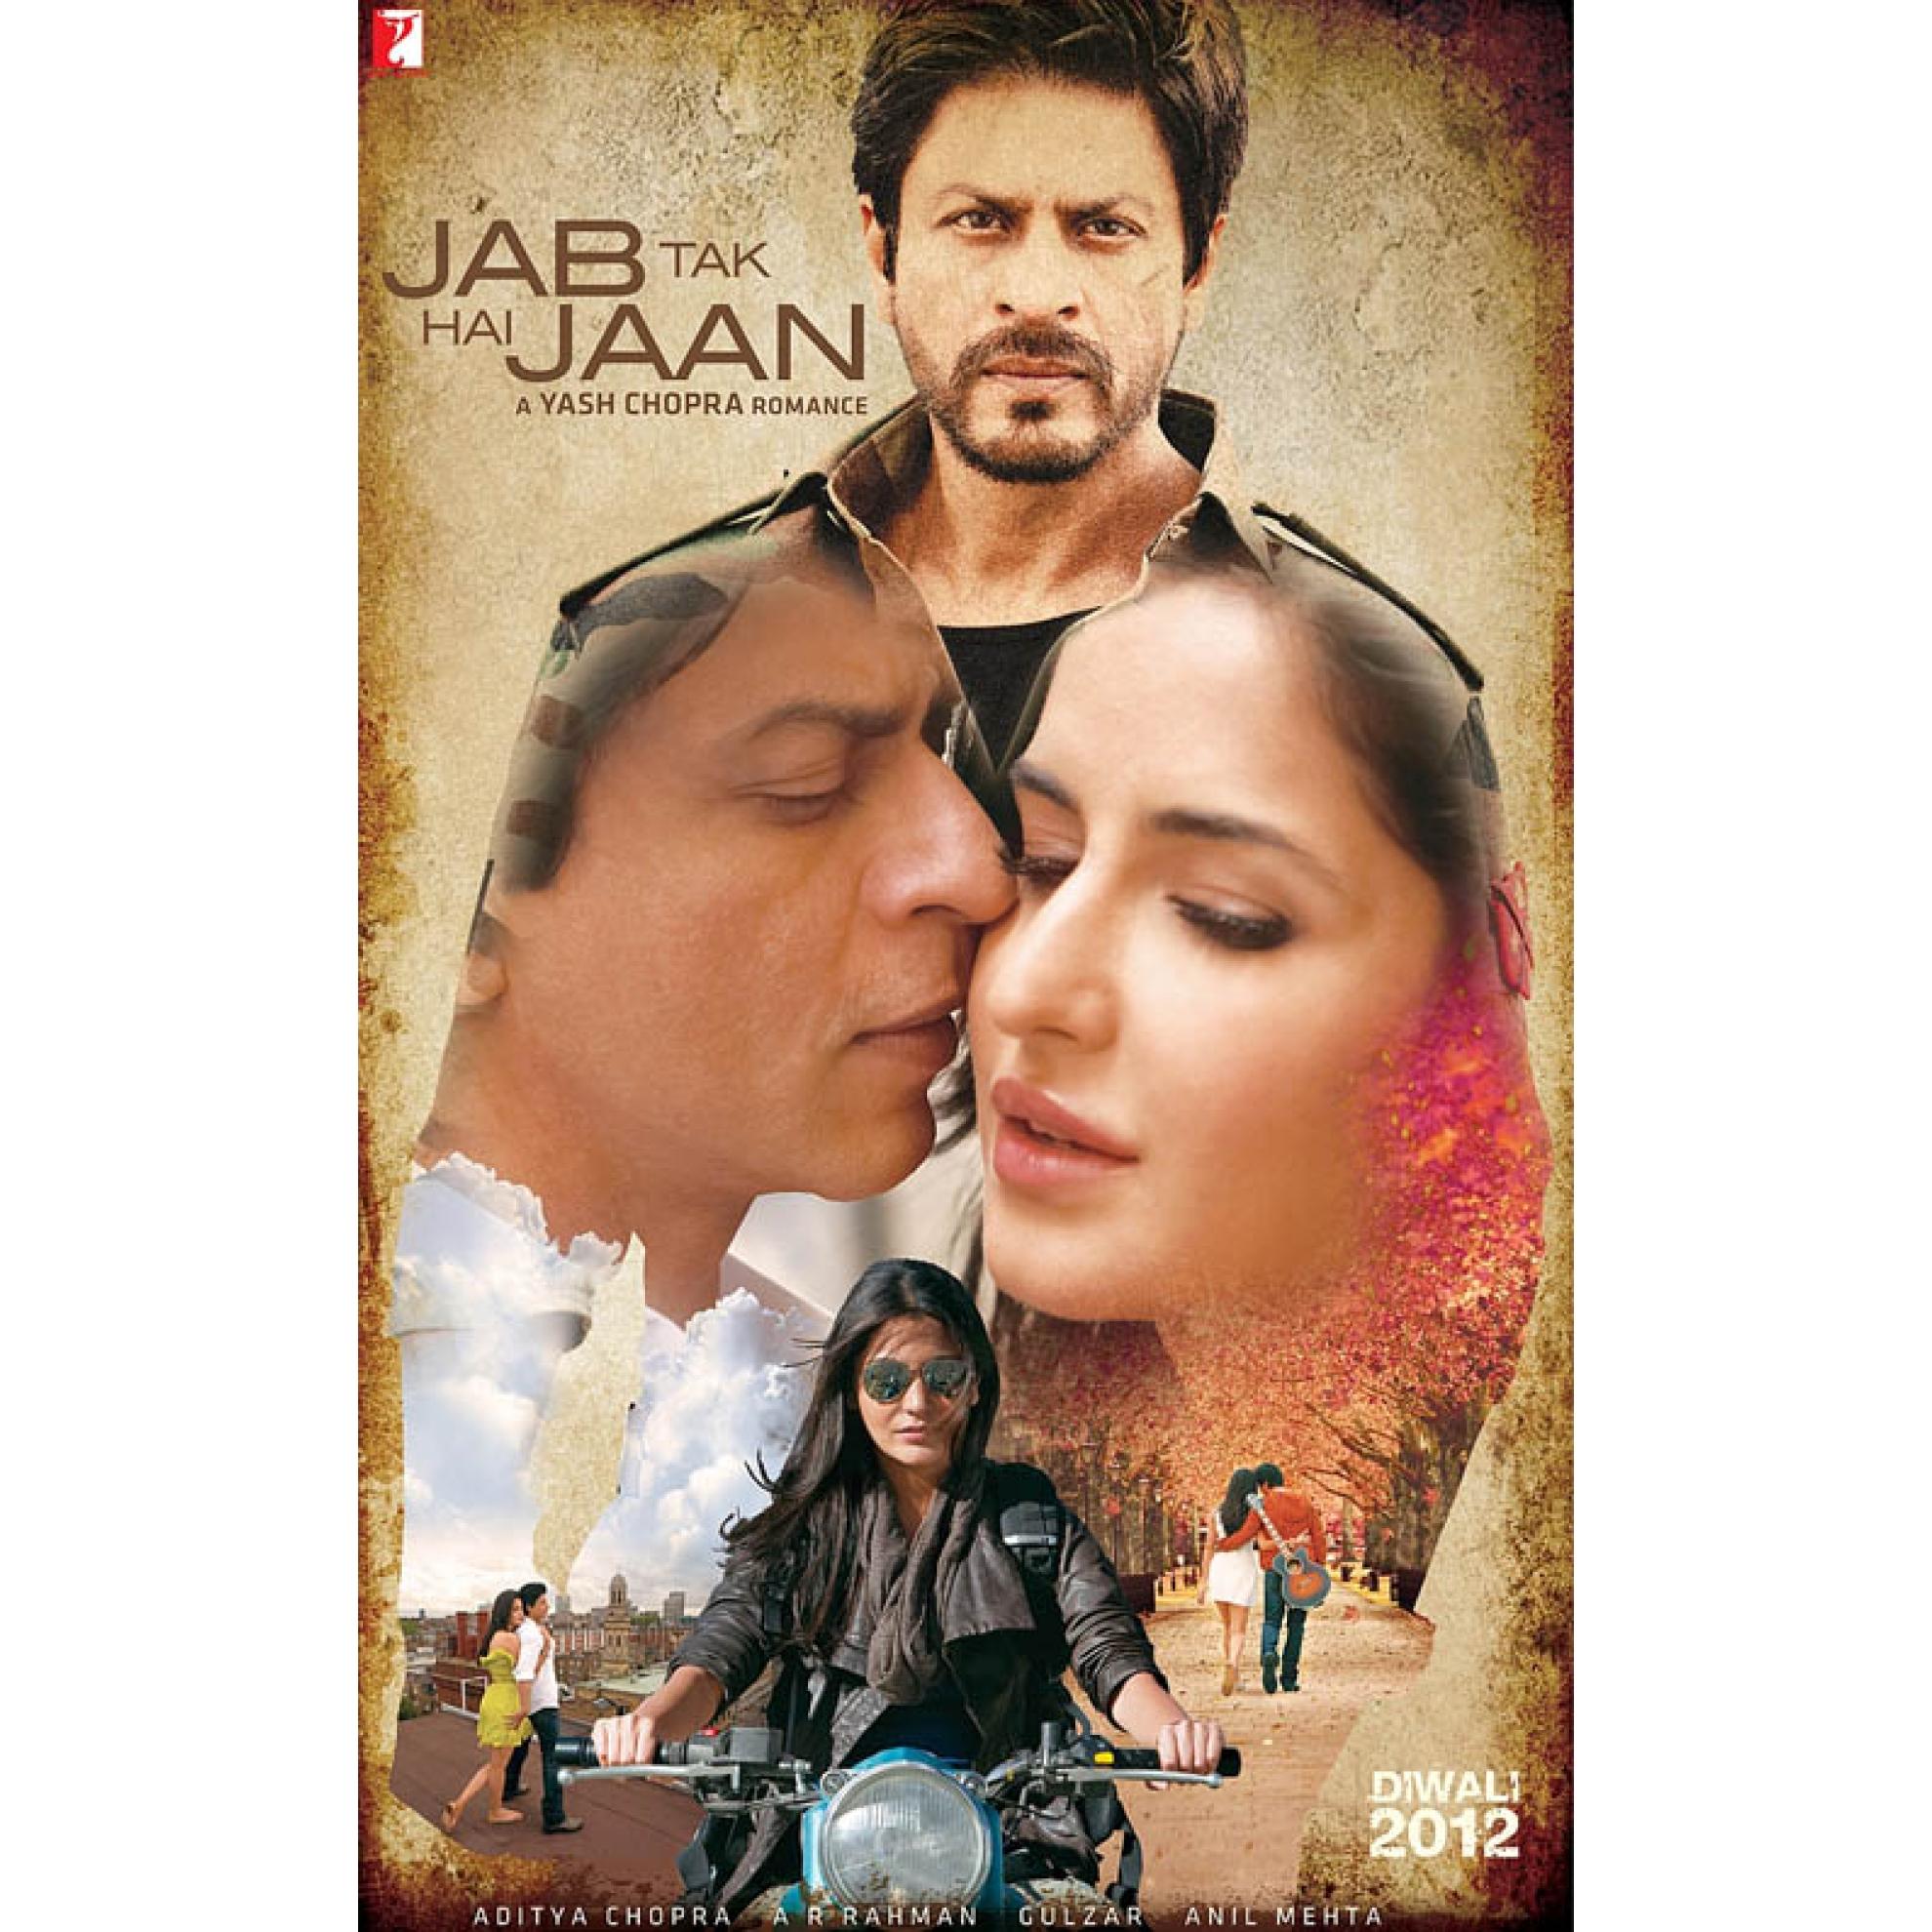 POSTER Jab Tak Hai Jaan  Jab Tak Hai Jaan Movie Poster